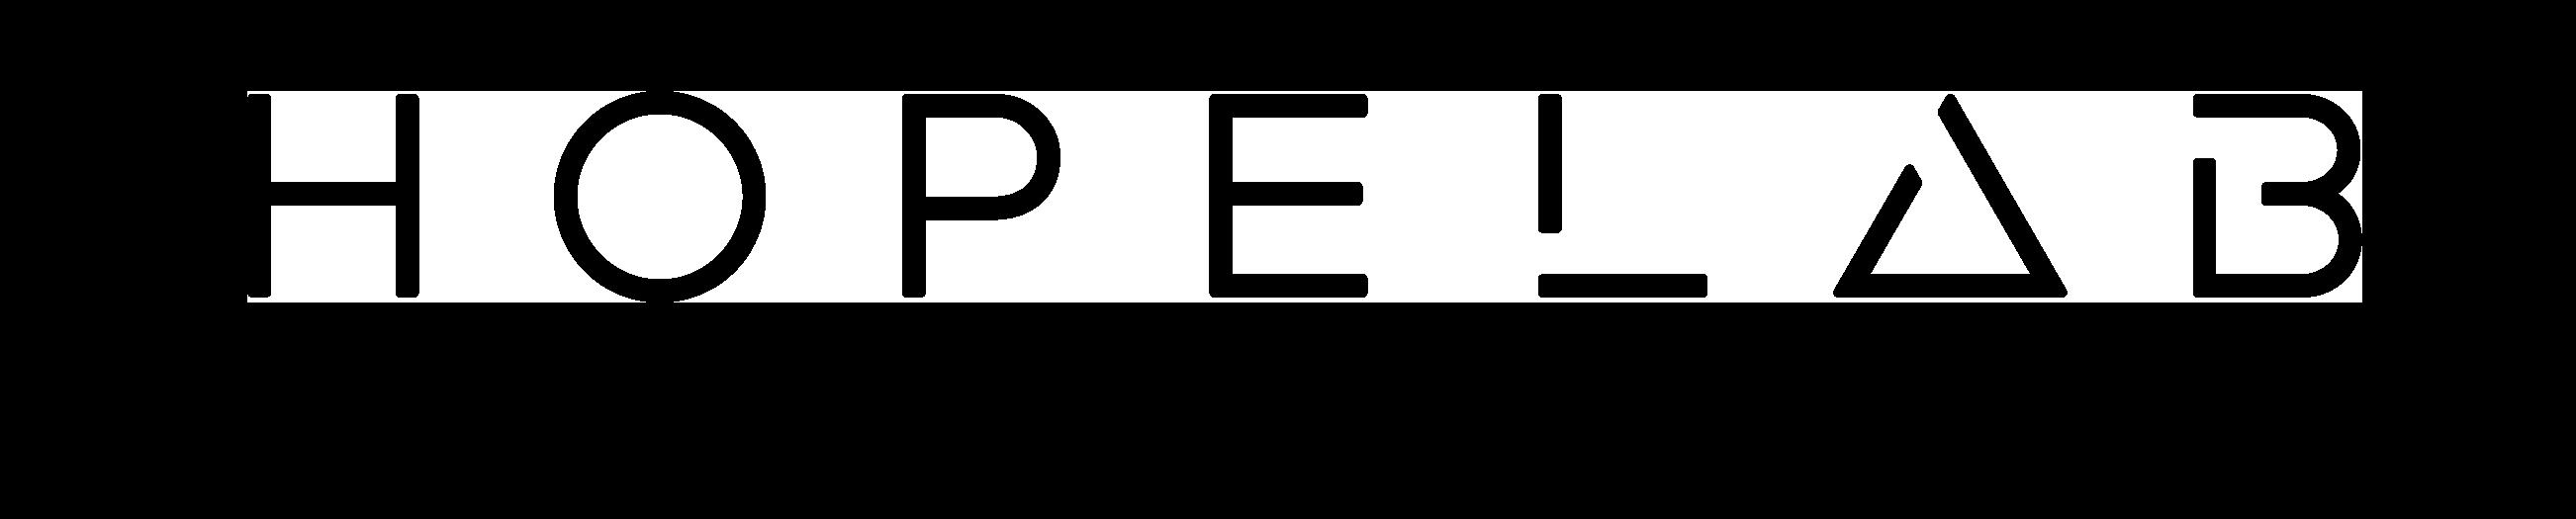 hopelab logo